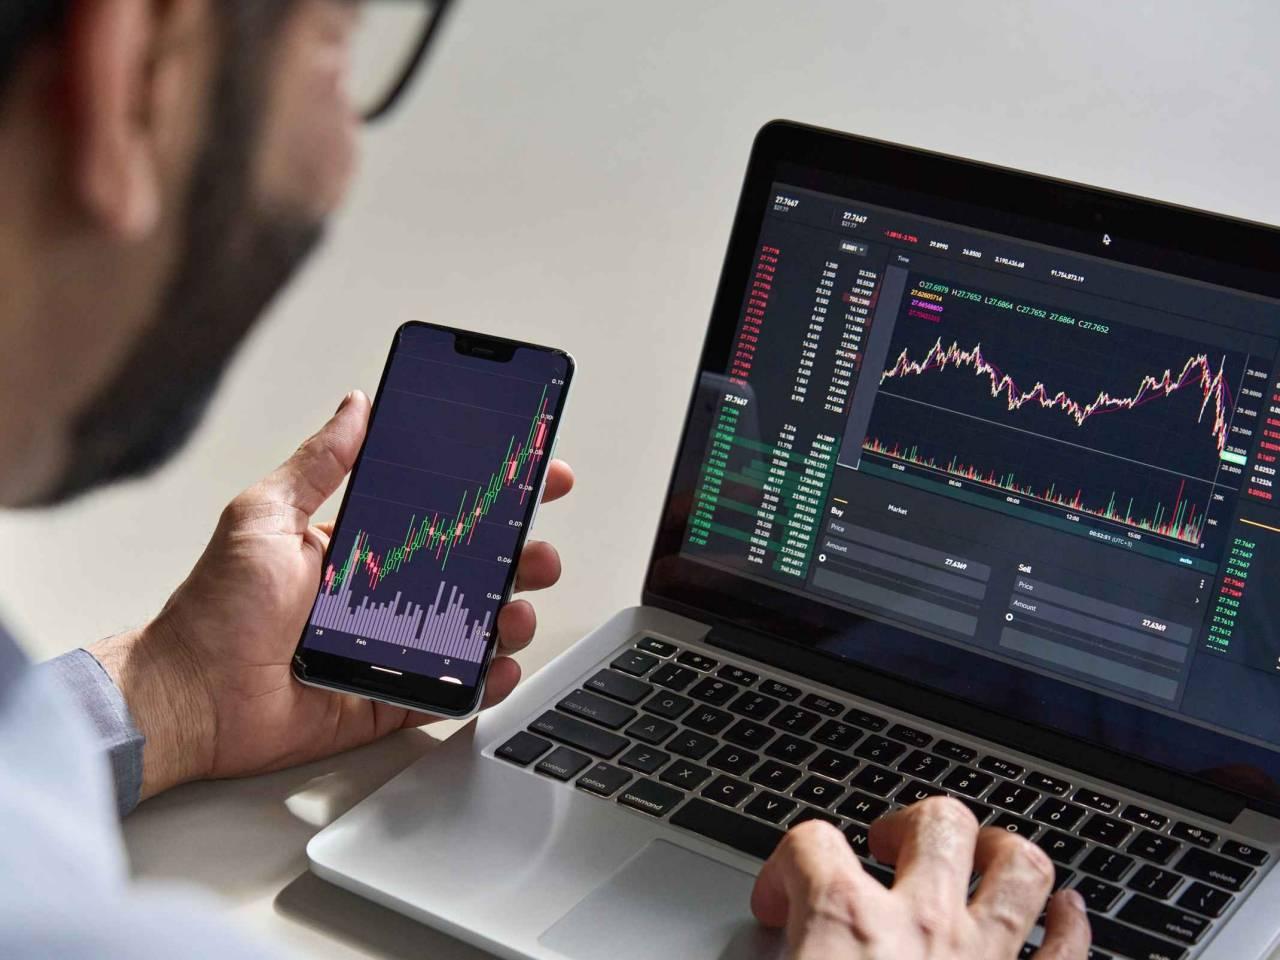 Business man trader investor analyst using mobile phone app analytics